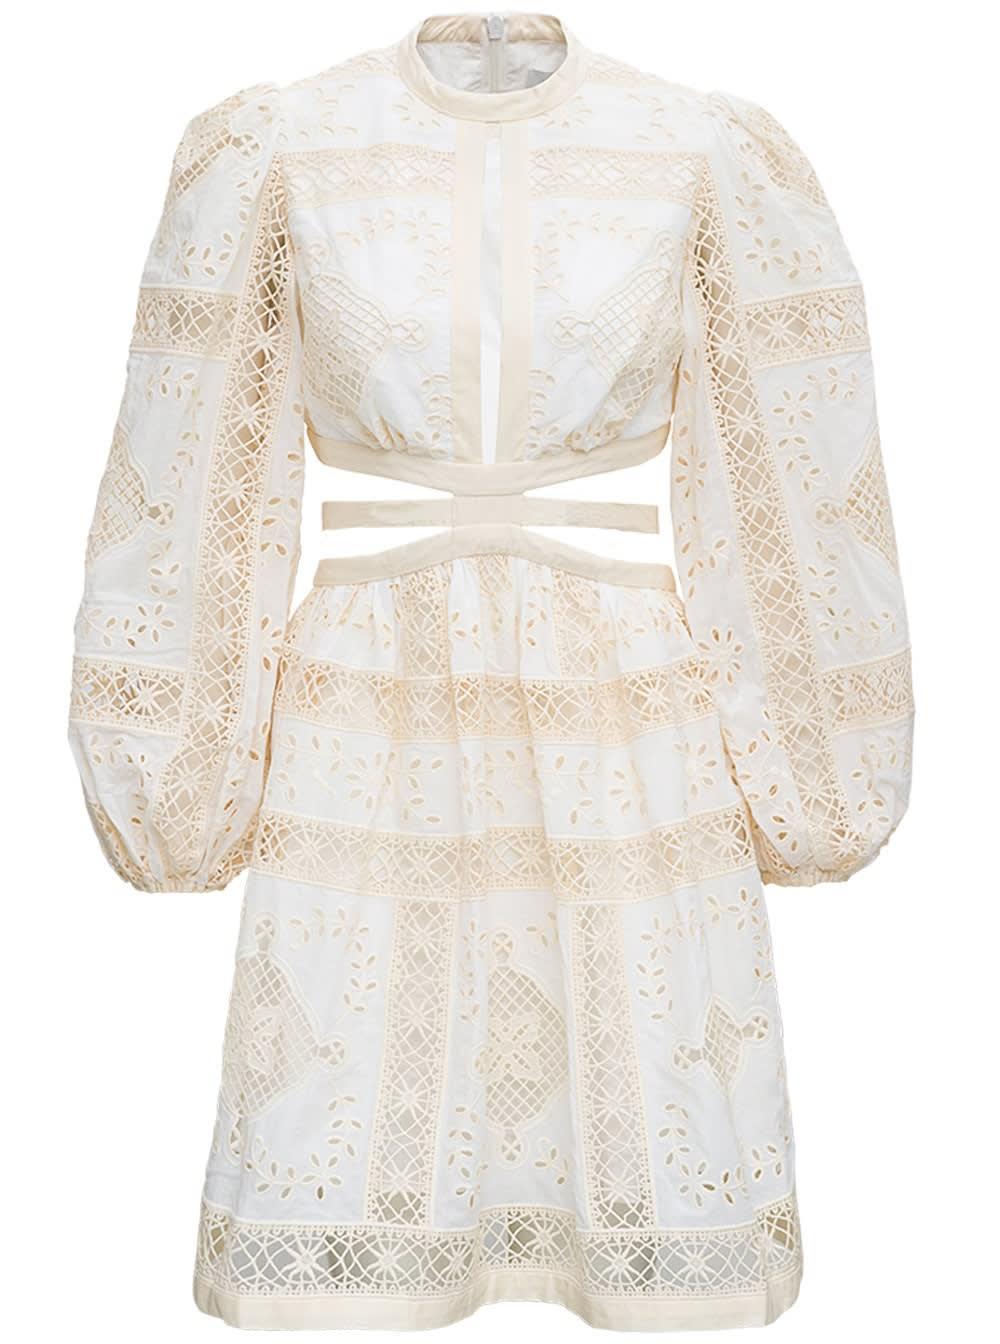 Buy Zimmermann Aliane Floral Openwork Cotton Dress online, shop Zimmermann with free shipping